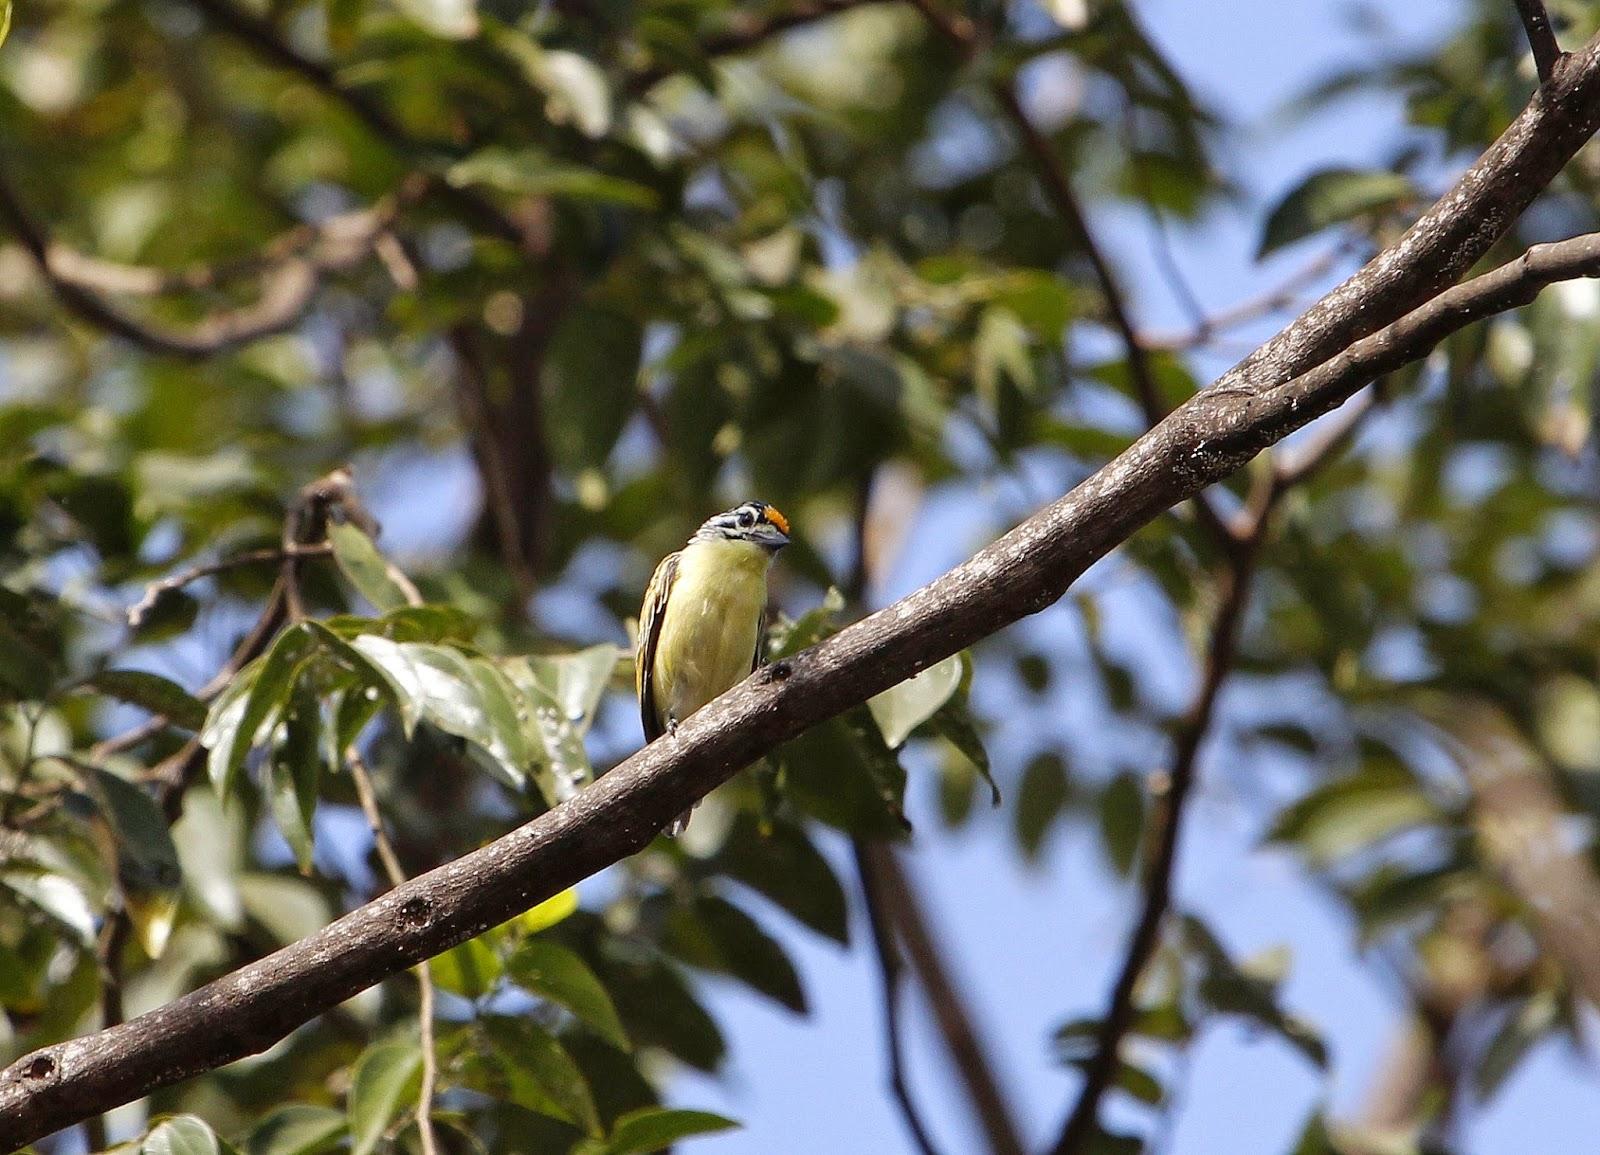 yellow-fronted tinkerbird (Pogoniulus chrysoconus) in the botanical garden Bakau